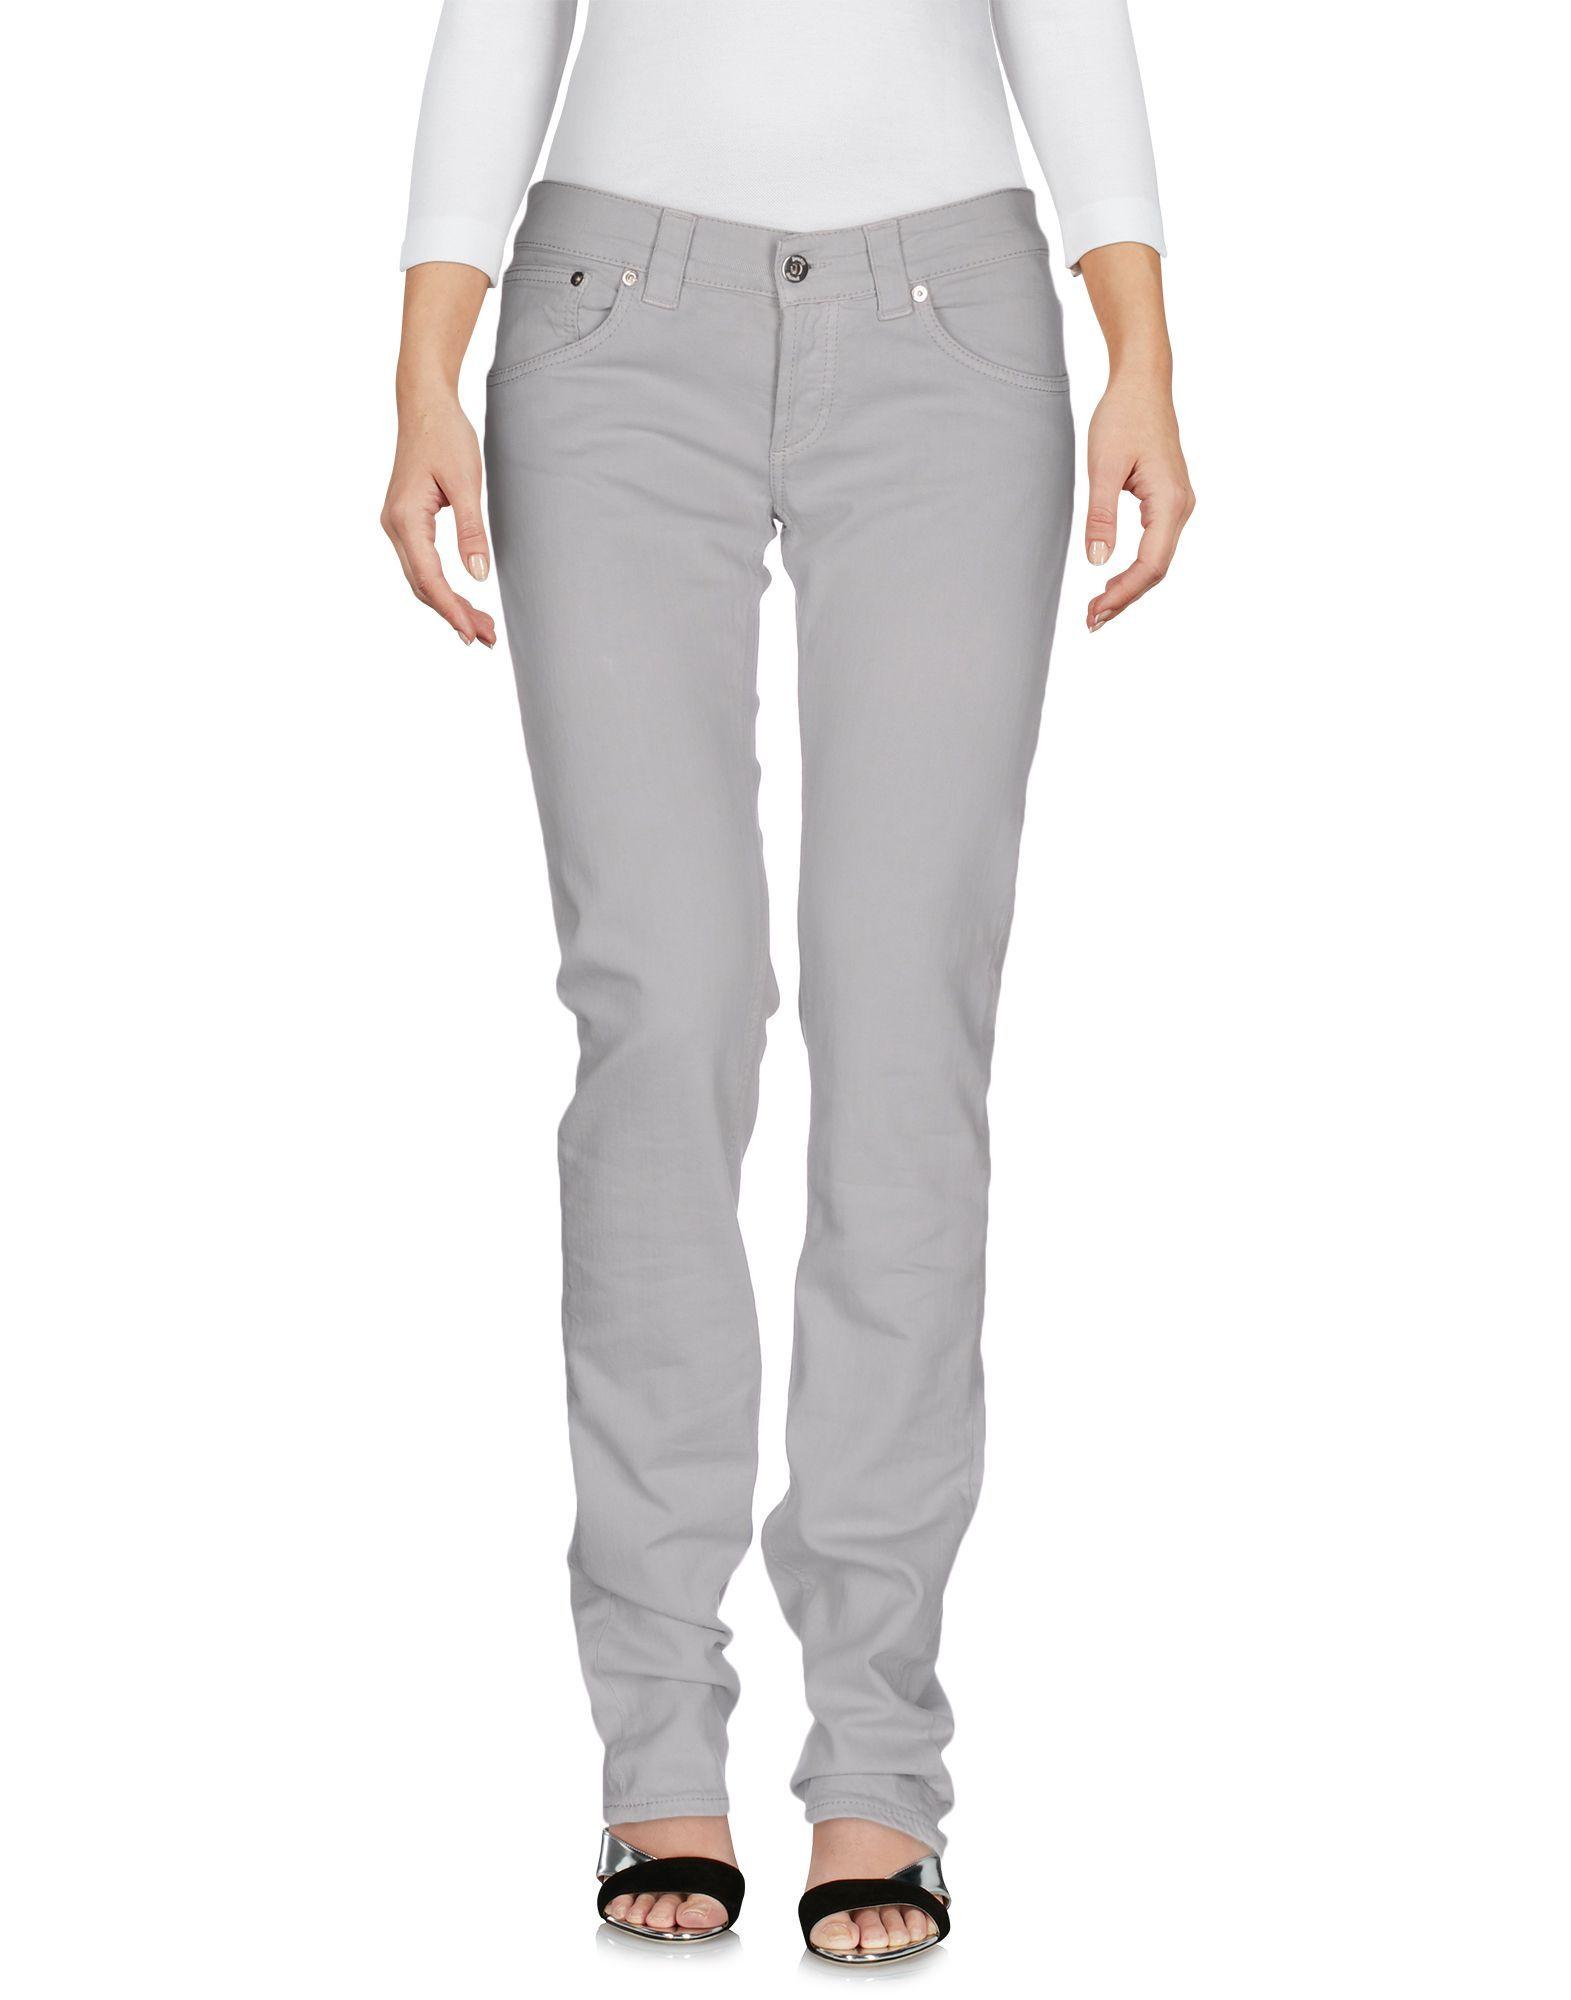 Dondup Light Grey Cotton Jeans